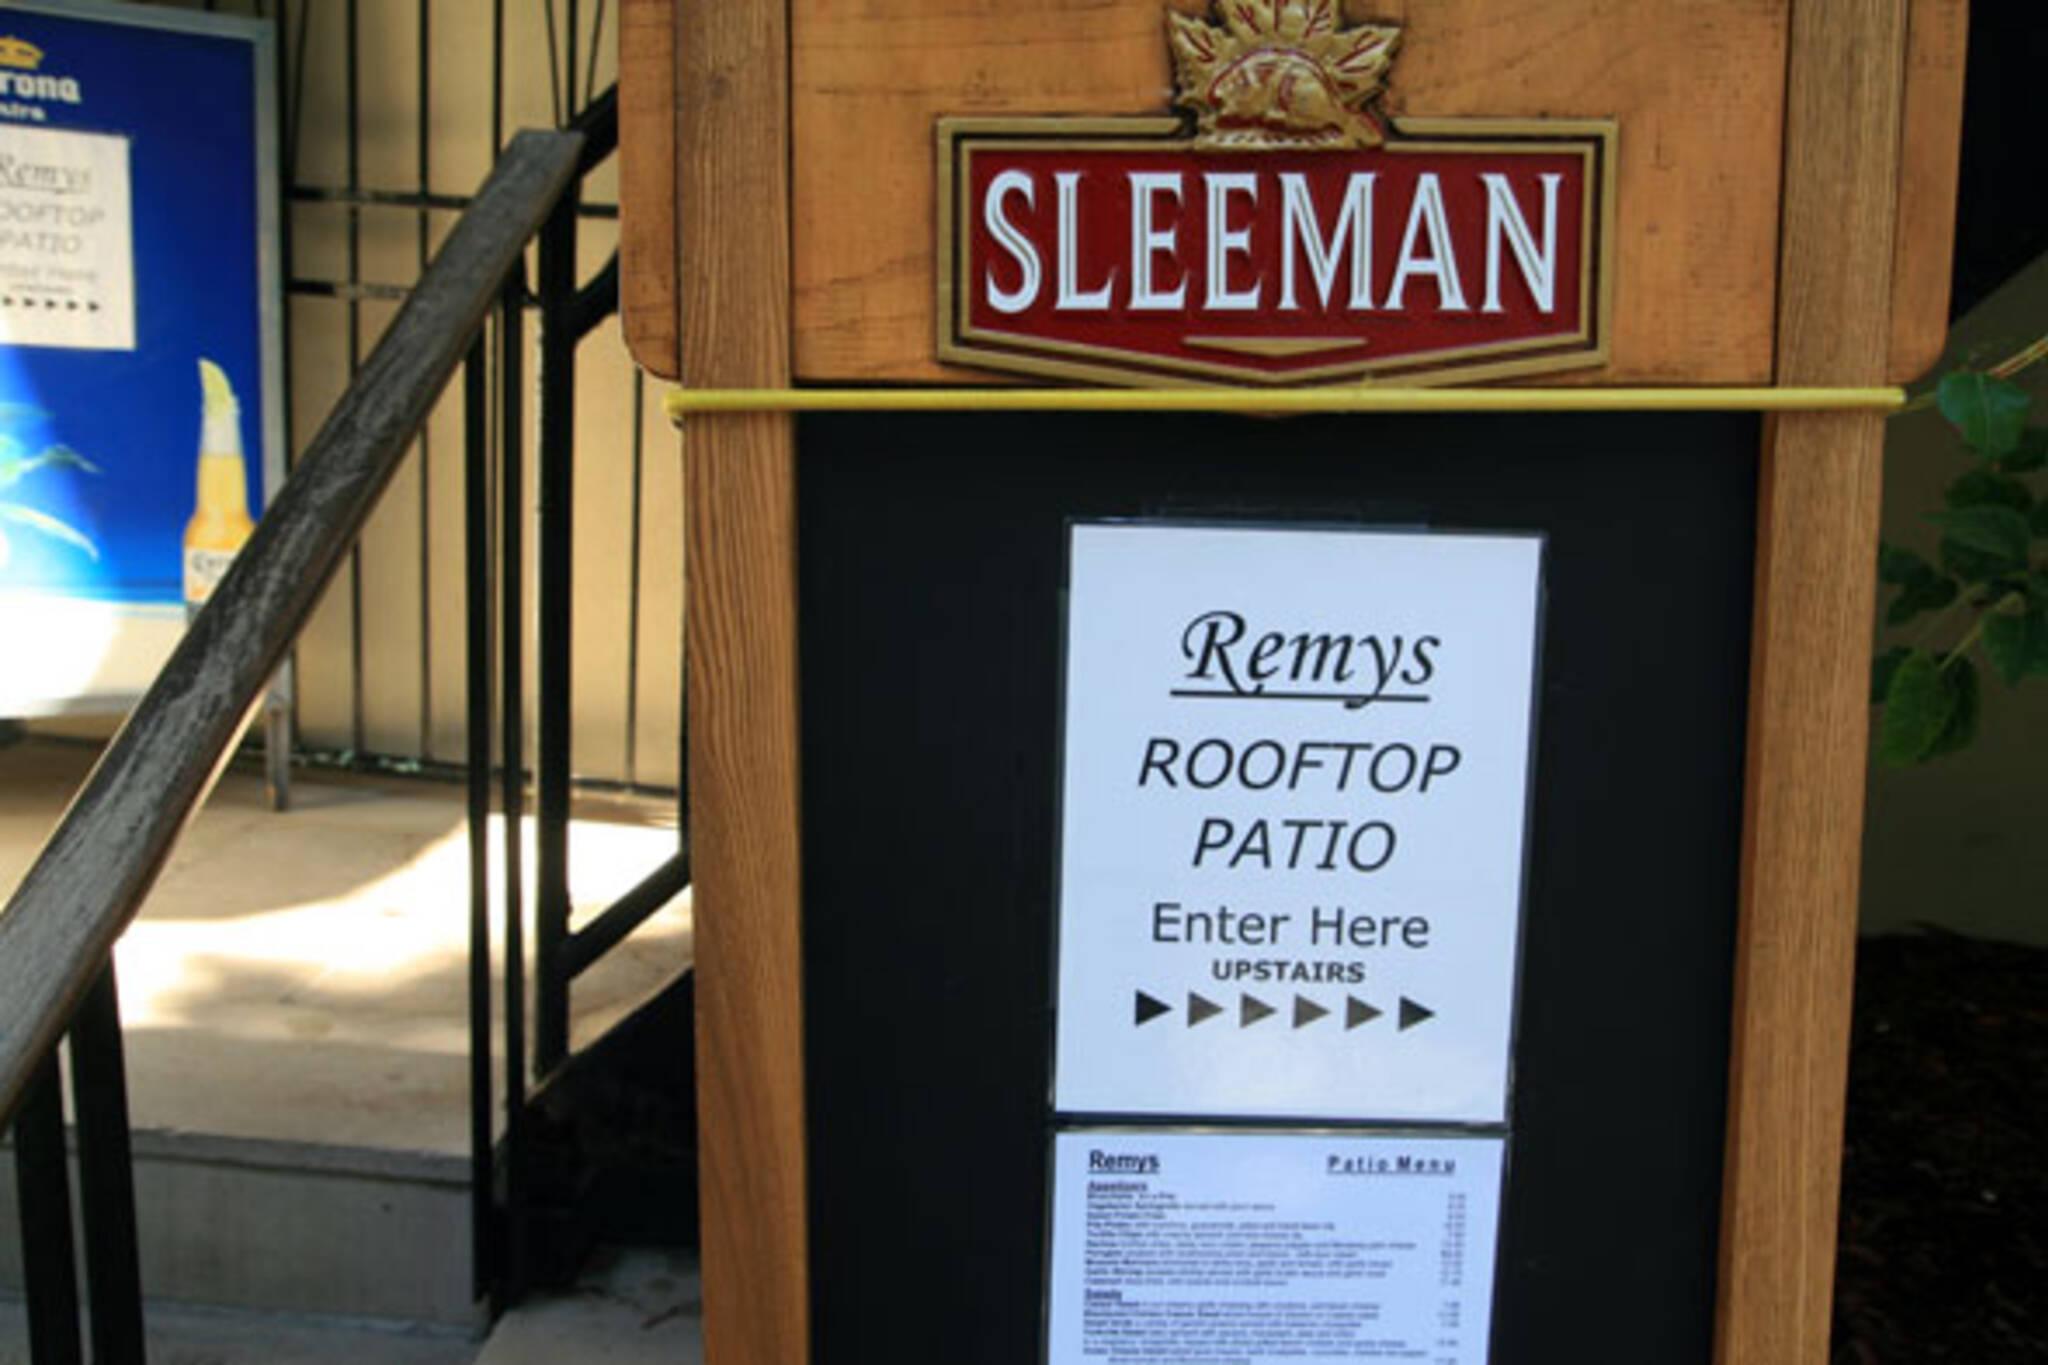 Remy's Toronto